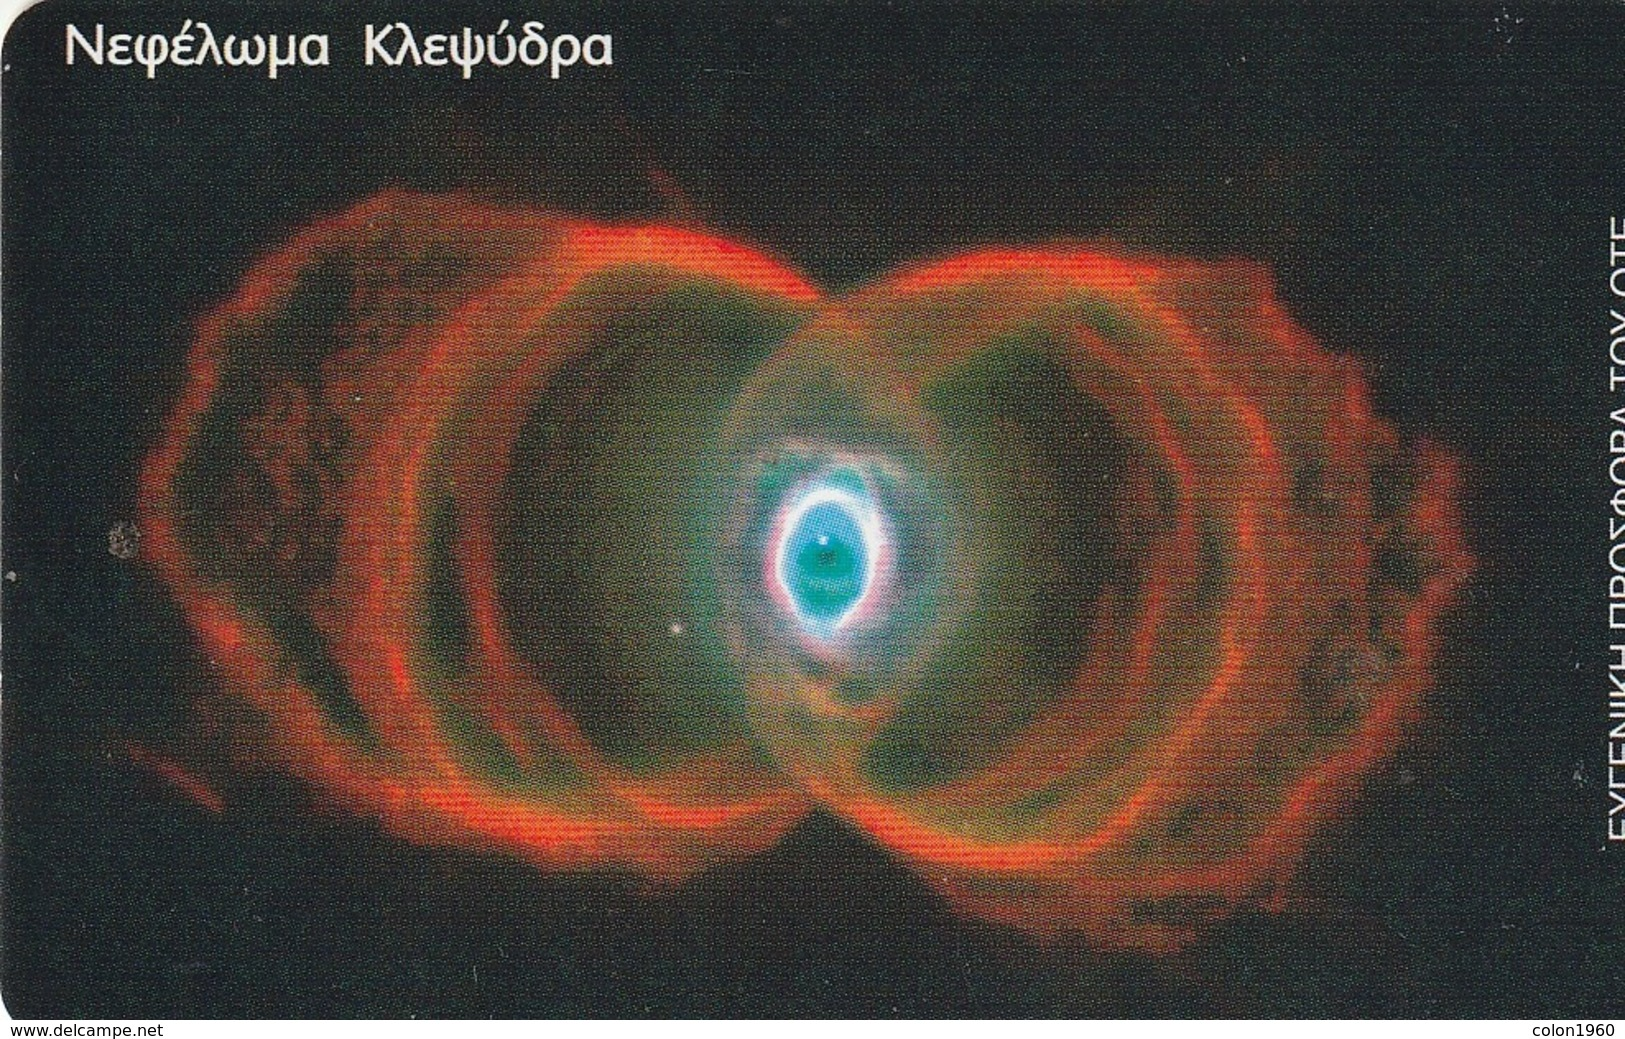 TARJETA TELEFONICA DE GRECIA. Planetarium And Space. Planetarium 7, X1179a (041) - Espacio